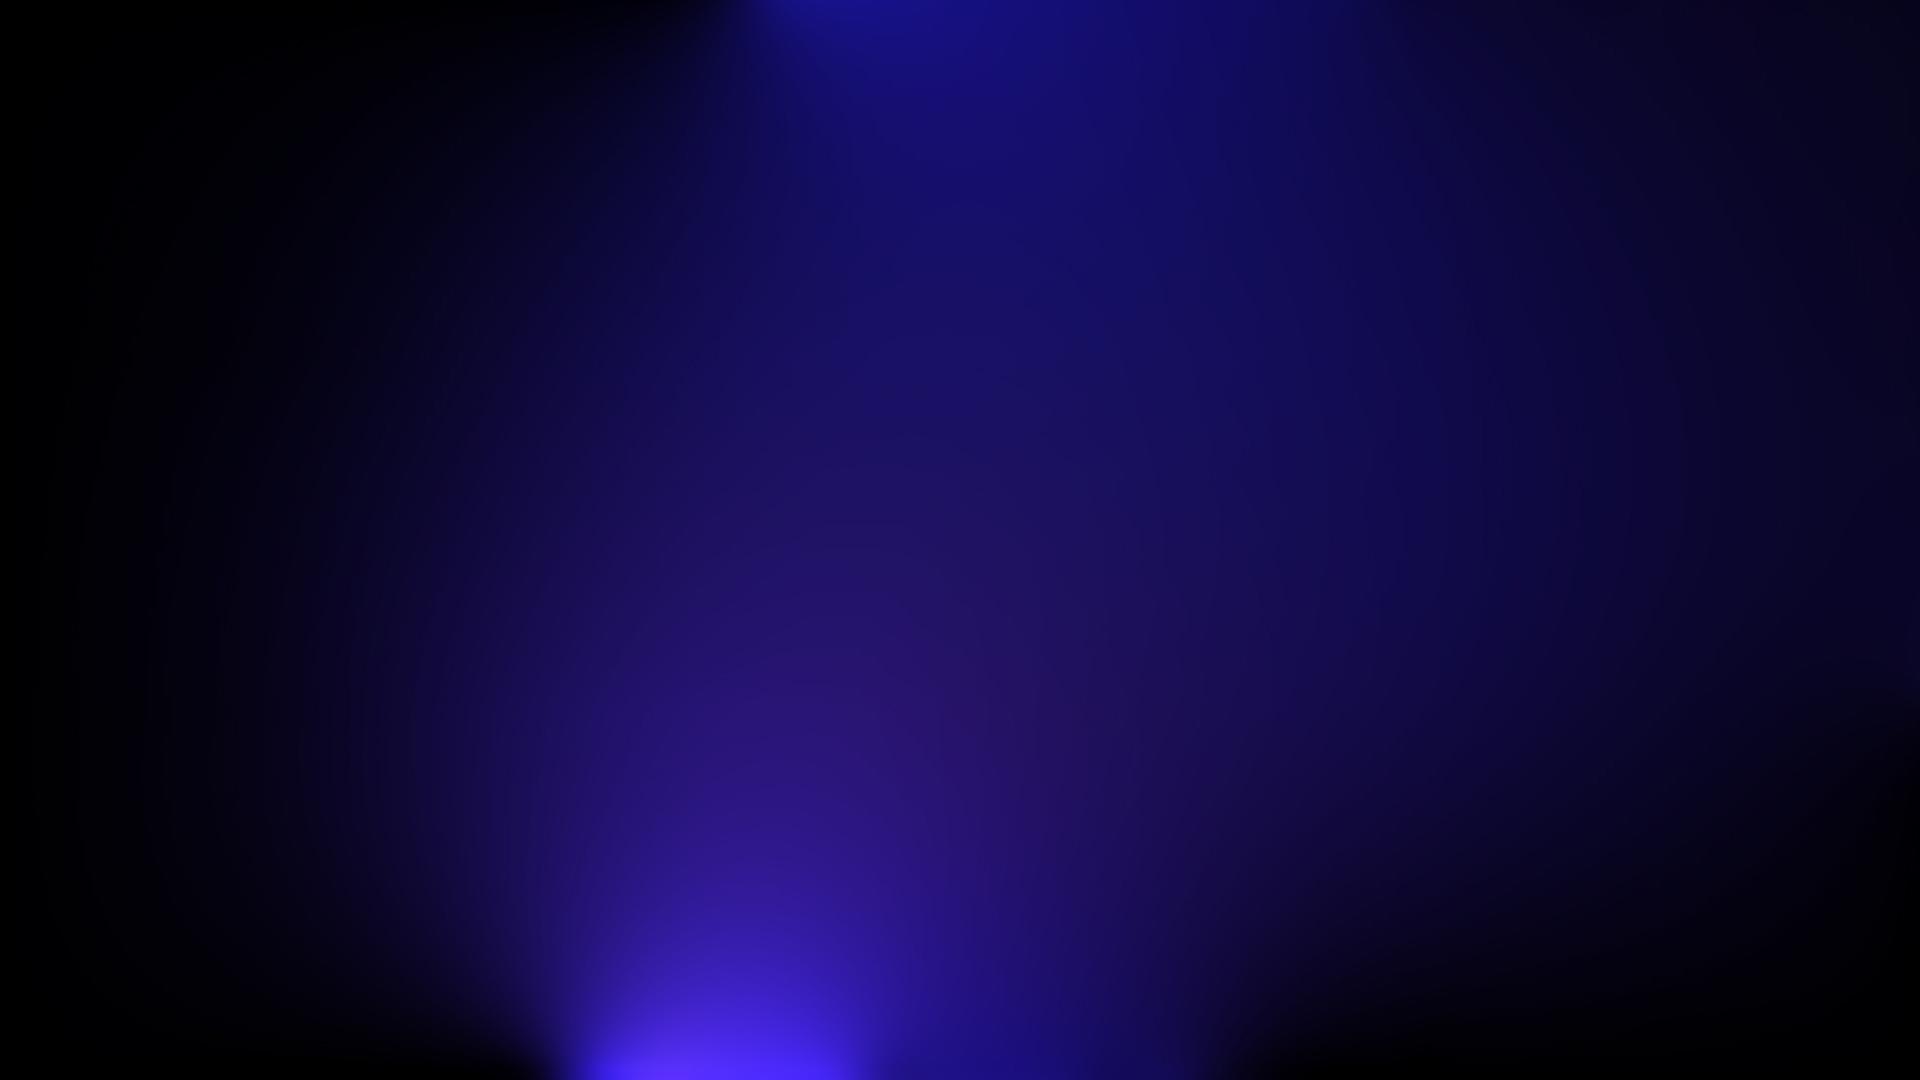 navy blue wallpaper navy blue wallpaper 6803735 1920x1080